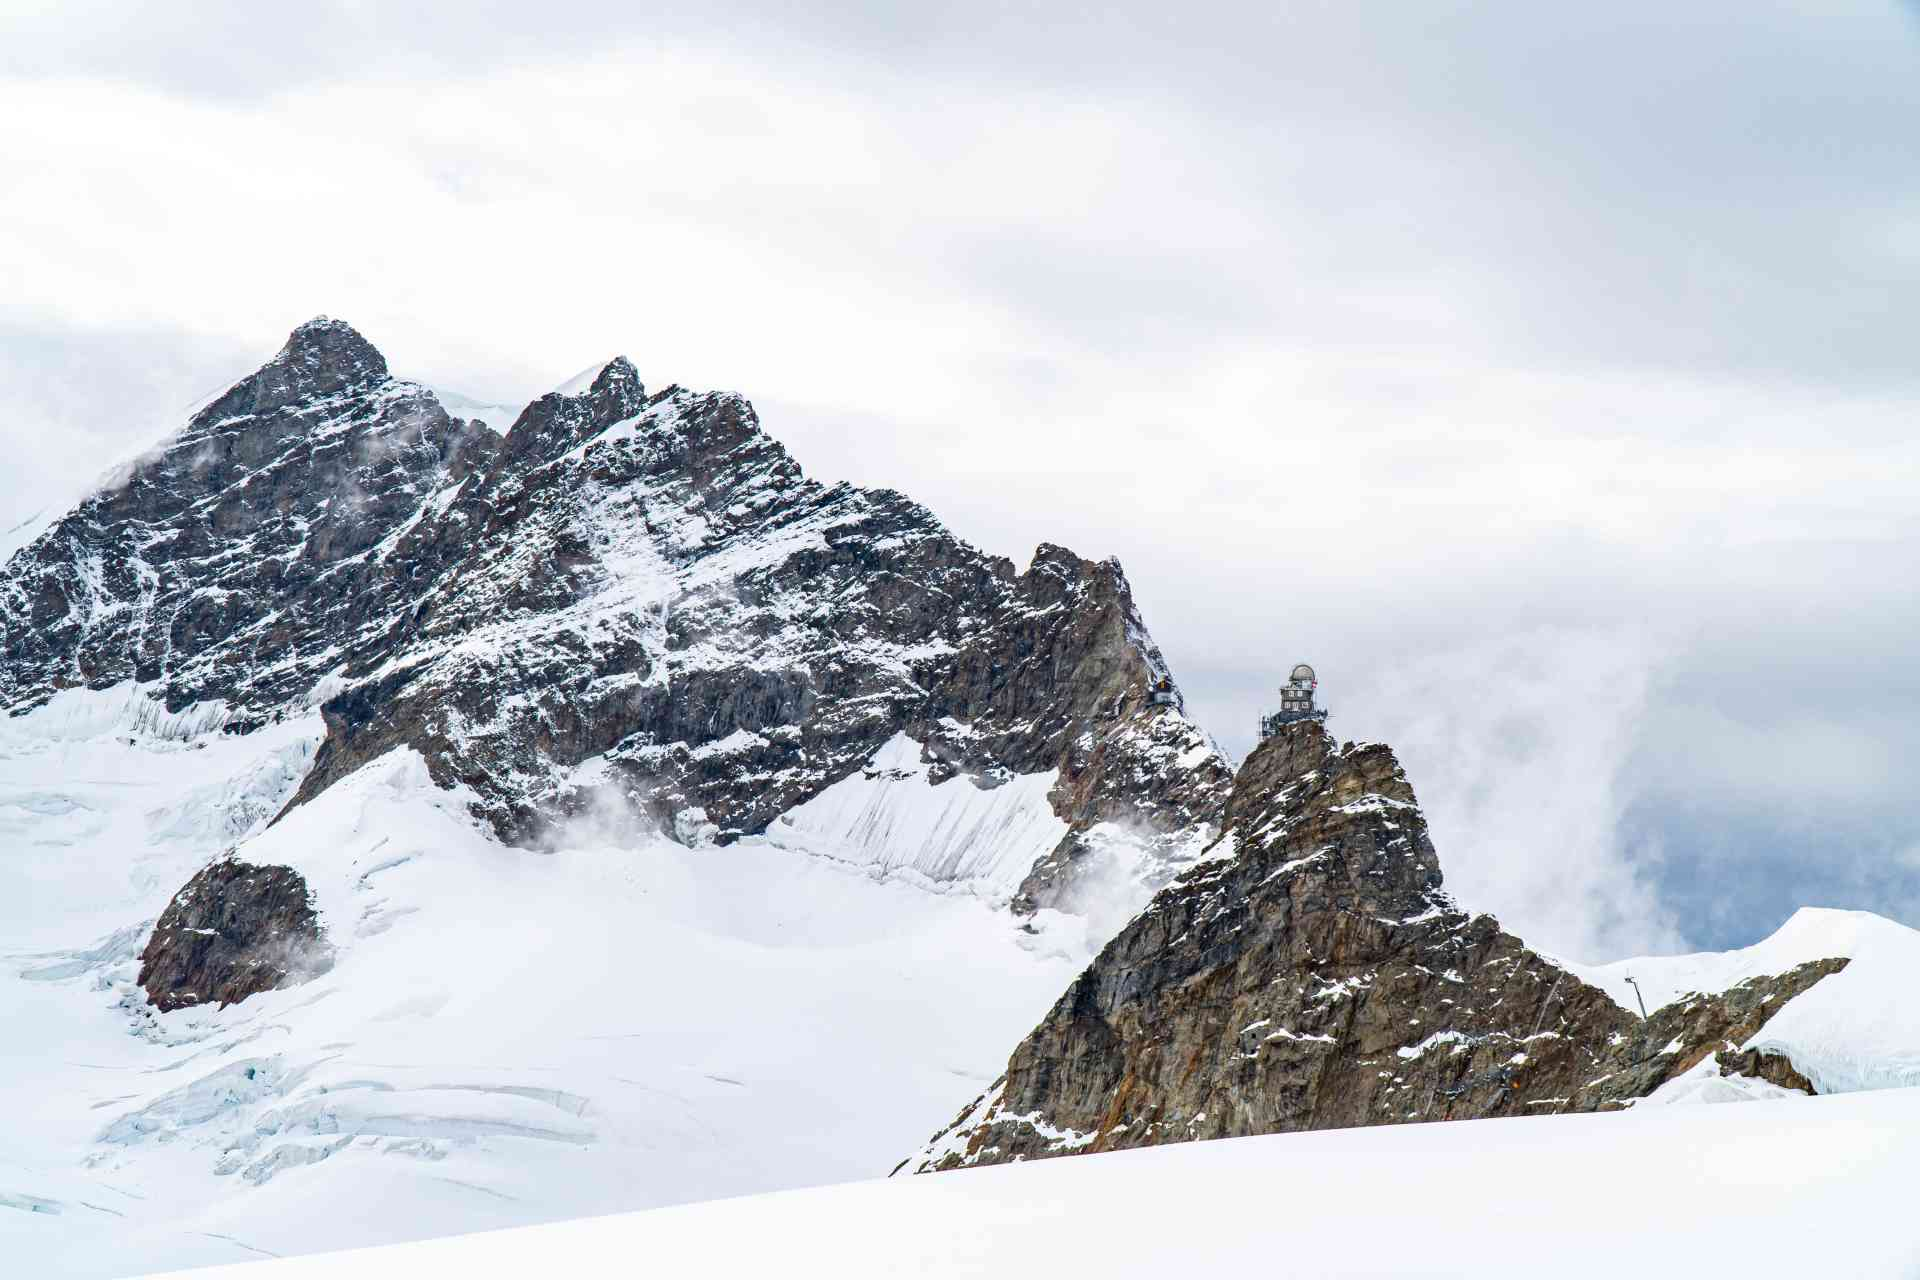 Jungfraujoch, Switzerland by Mirza Ariadi